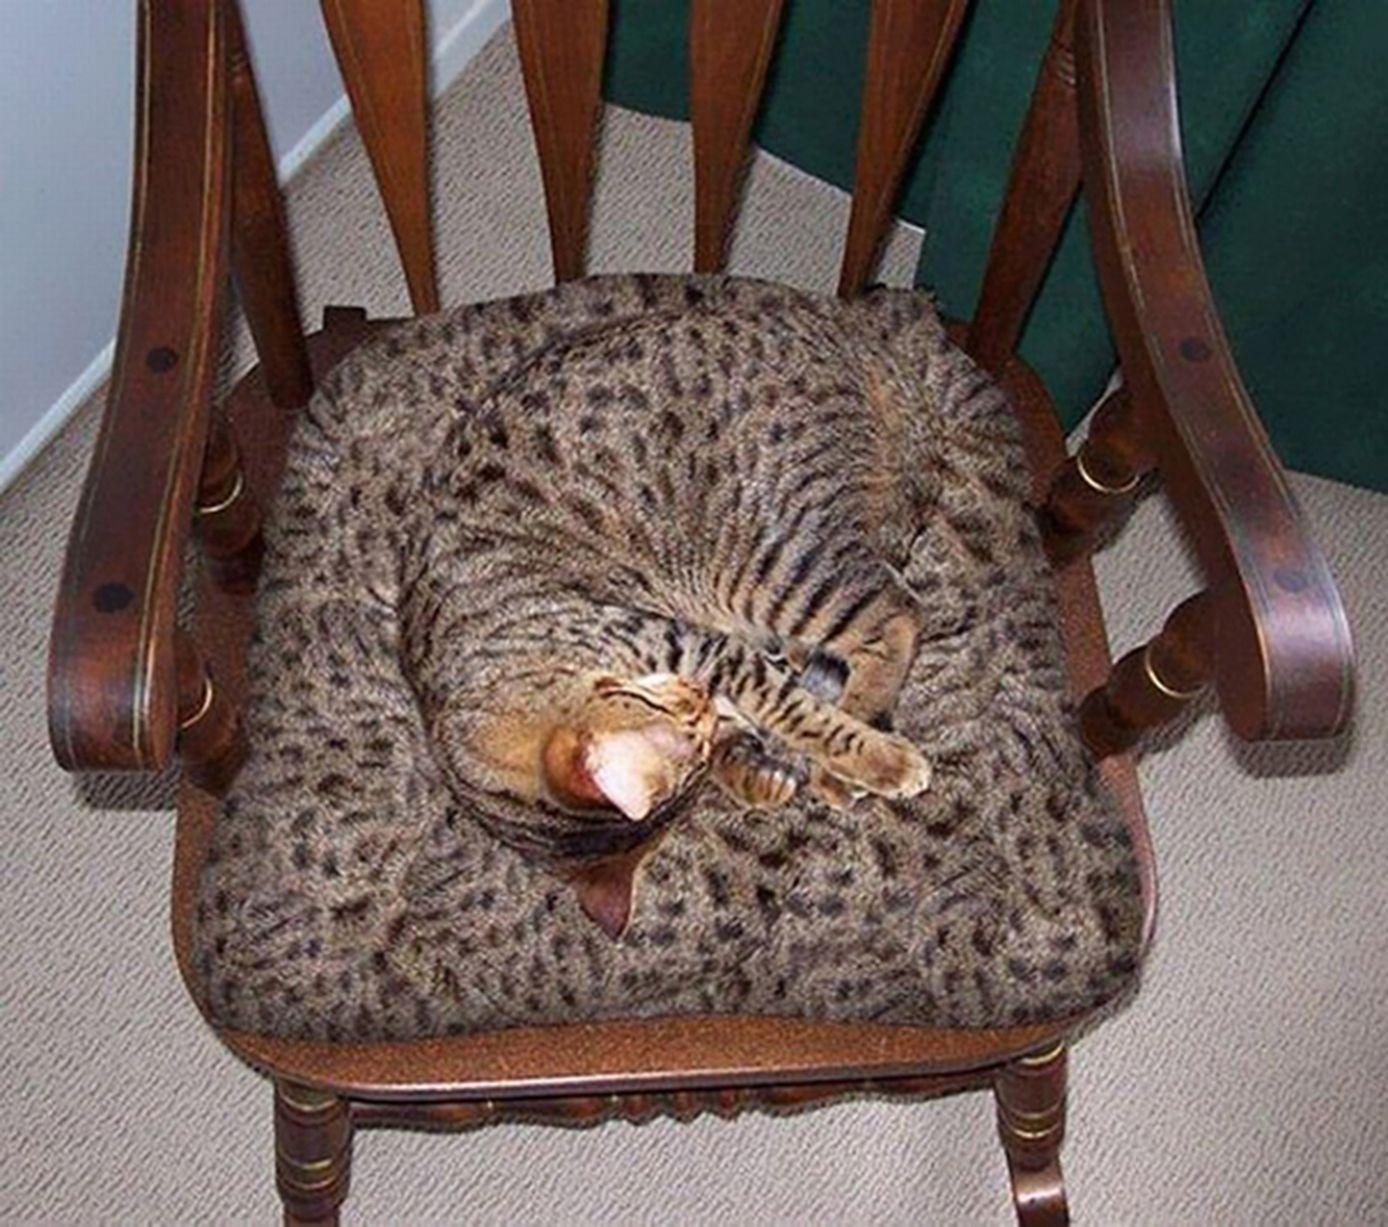 kamuflase kucing5 - 13 Aksi Kamuflase Kucing Yang Menggemaskan. Kamu Bisa Melihatnya ?